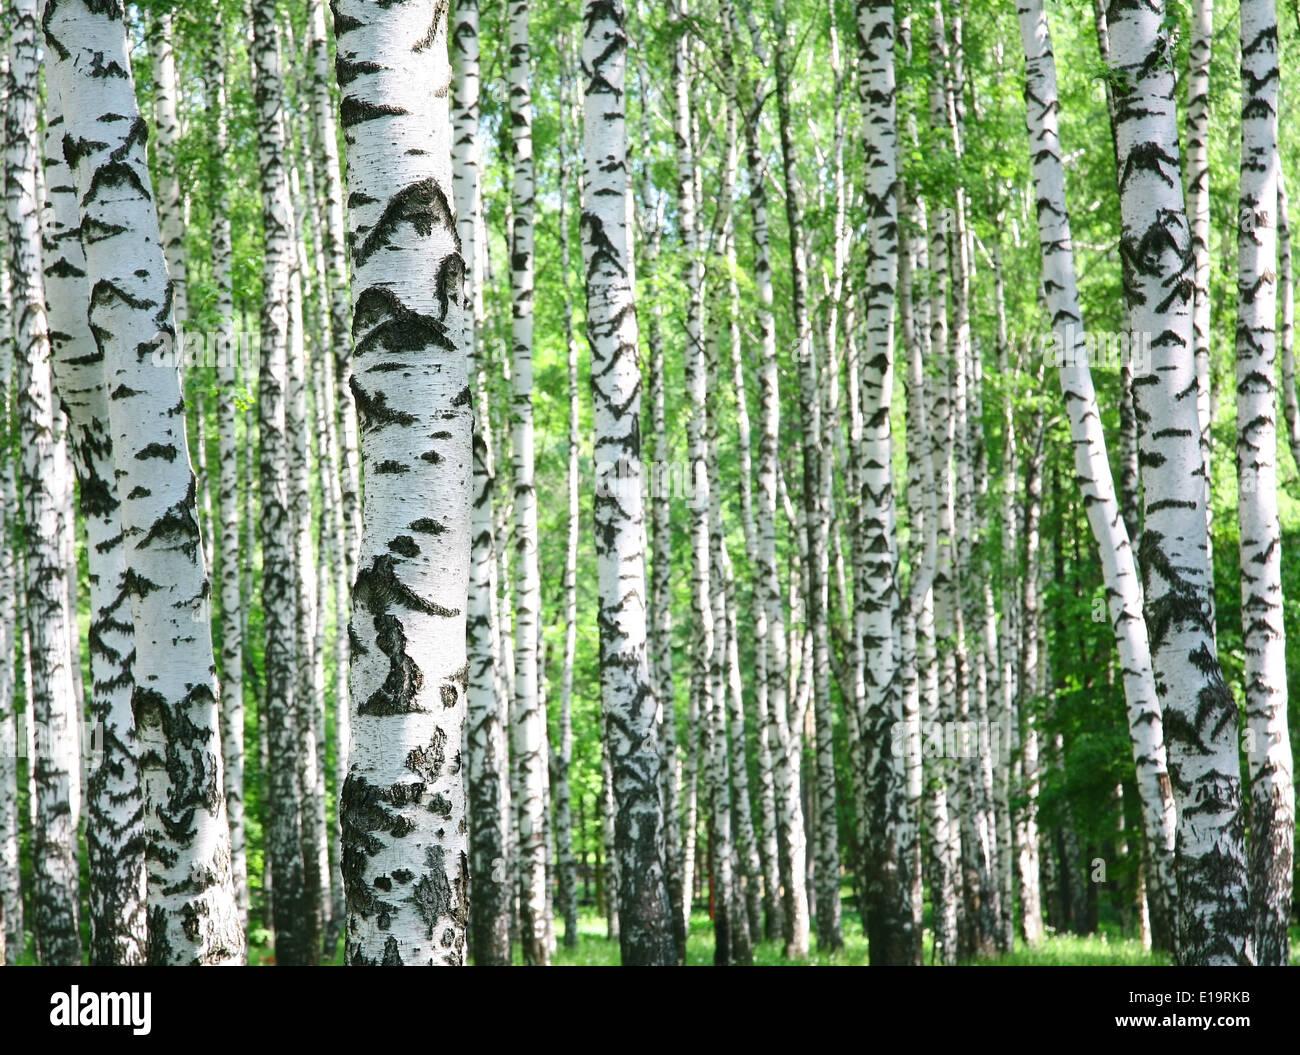 Trunks of birch trees in spring - Stock Image